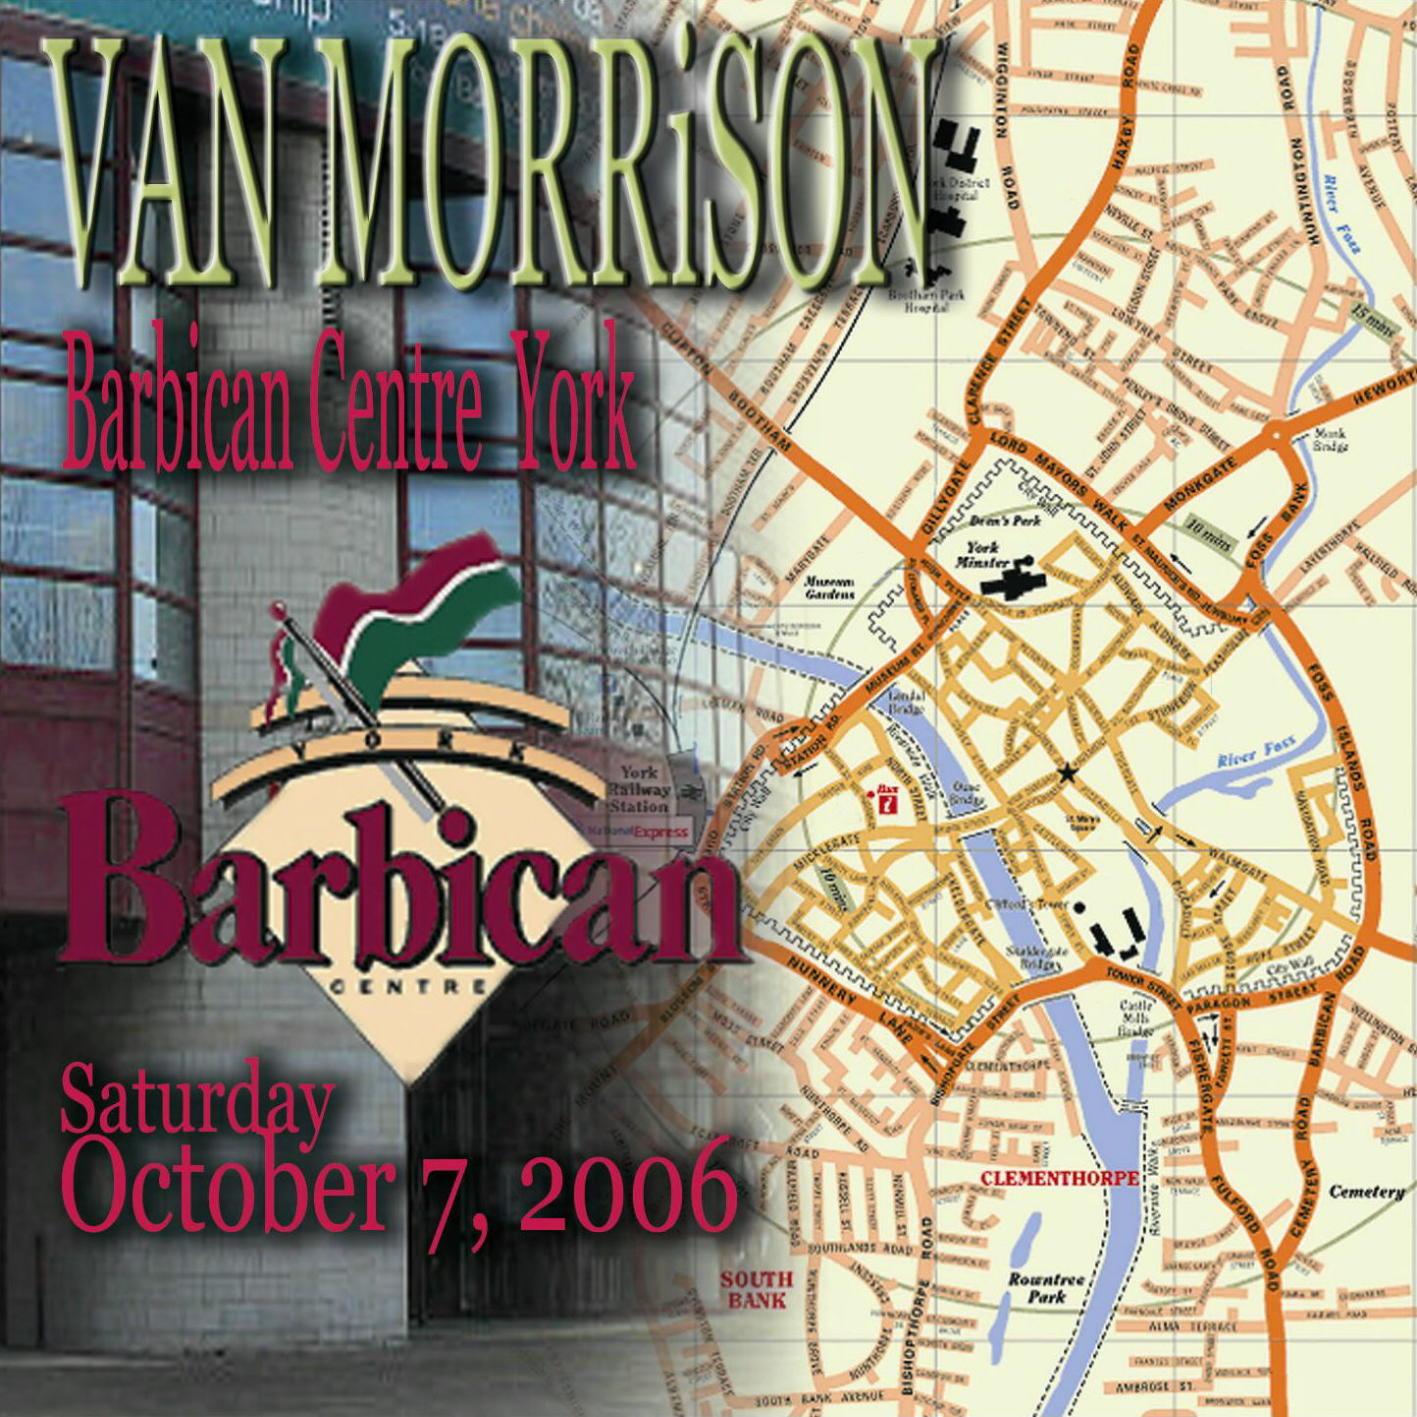 VanMorrison2006-10-07BarbicanCentreYorkUK1.jpg